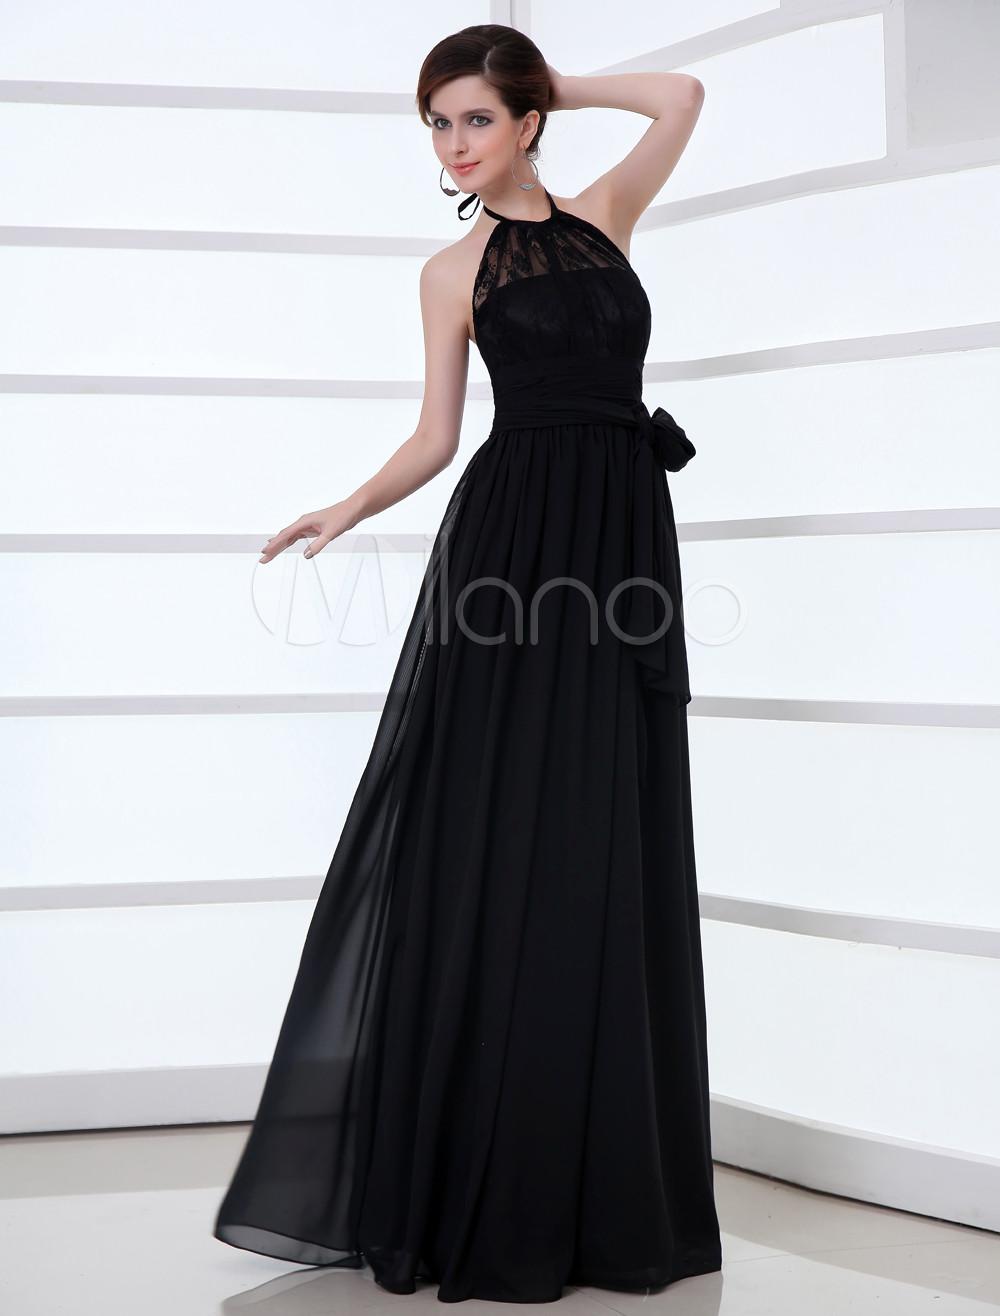 Elegant Black Chiffon Lace Halter Sexy Evening Dress (Wedding Evening Dresses) photo